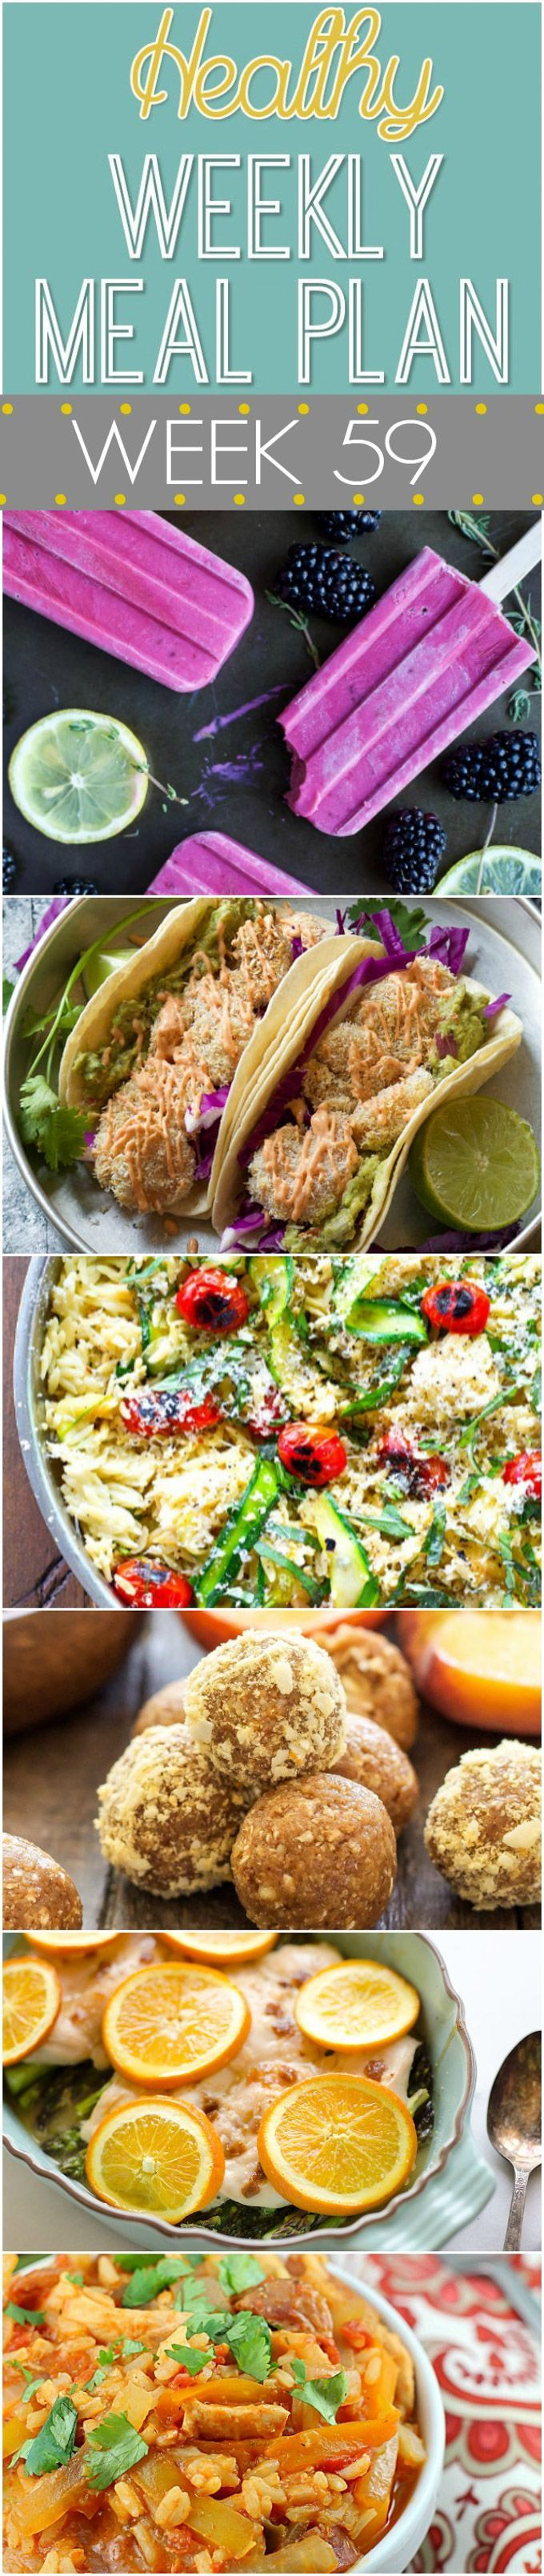 Healthy Weekly Meal Plan #59